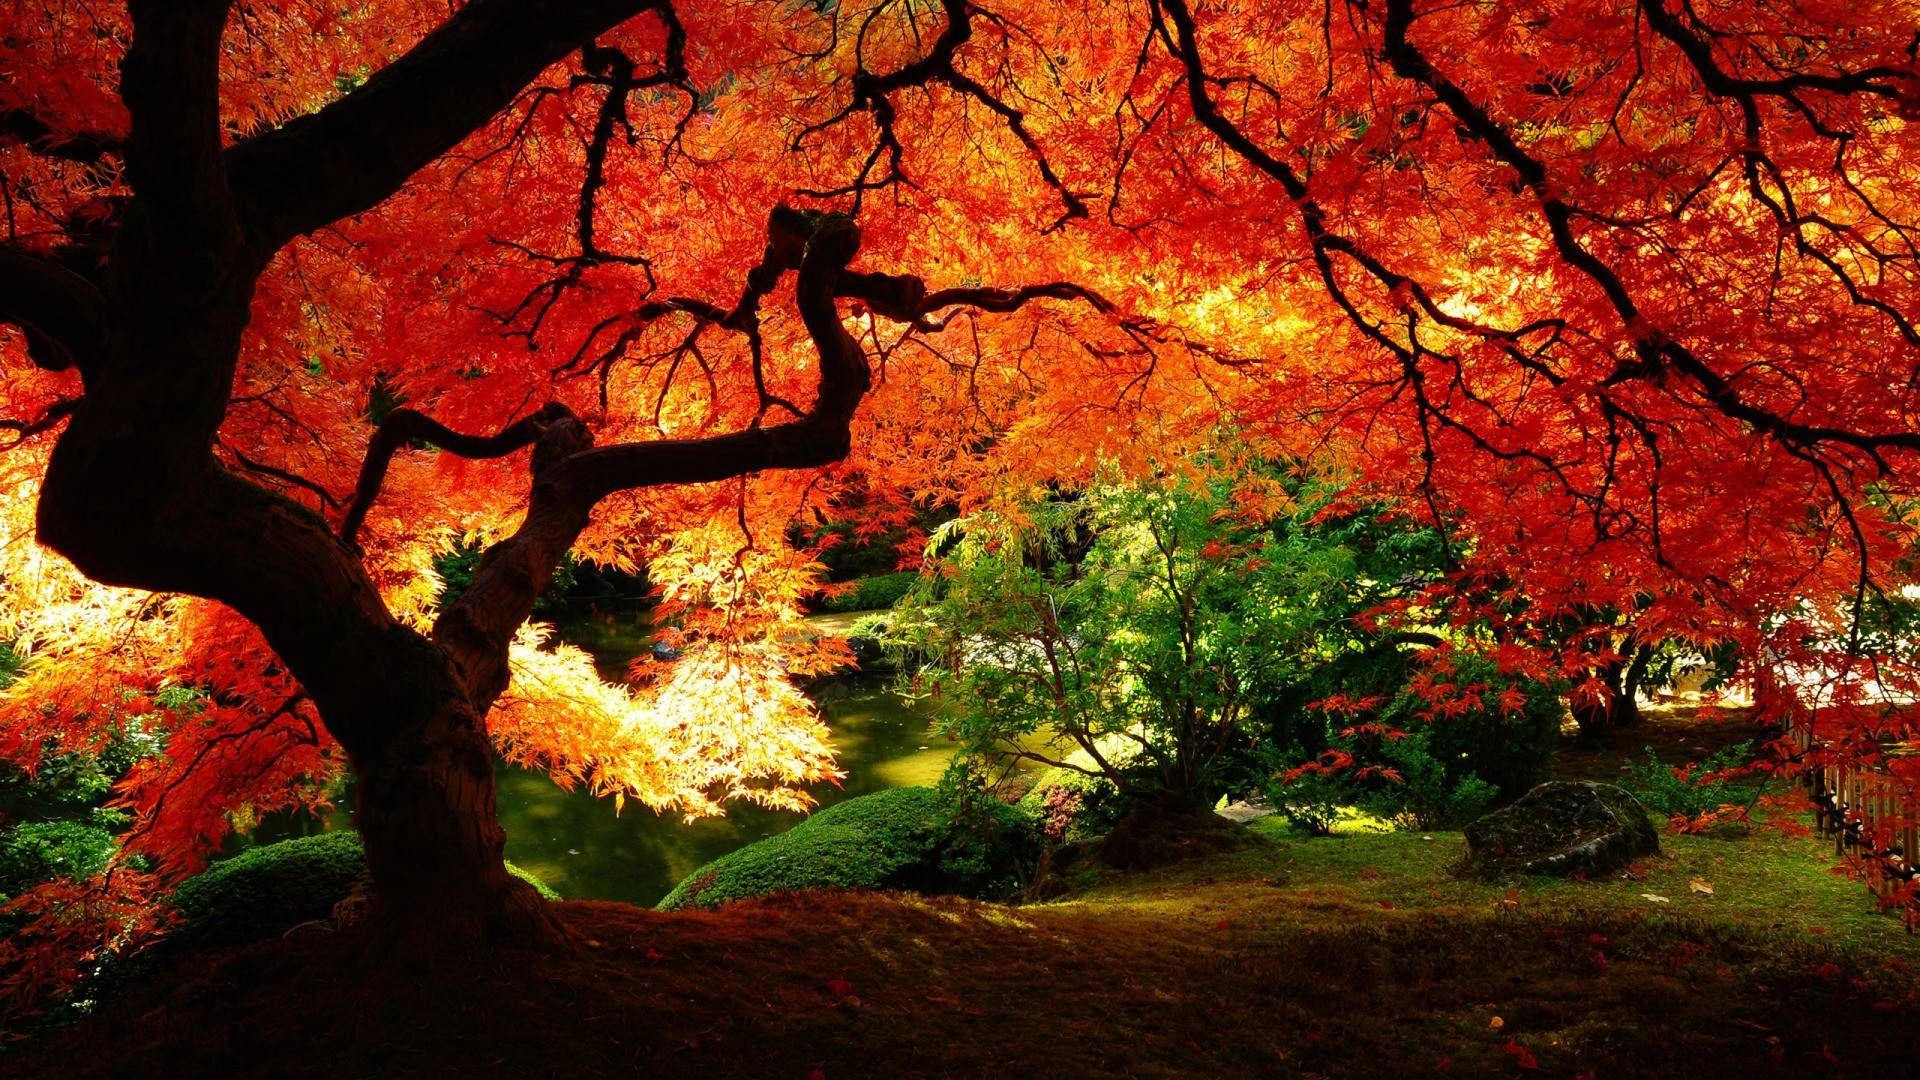 Japanese Garden Wallpaper HD Resolution 8s22 1920x1080 Px 46679 KB OtherJapanese Traditional Art Desktop Designs